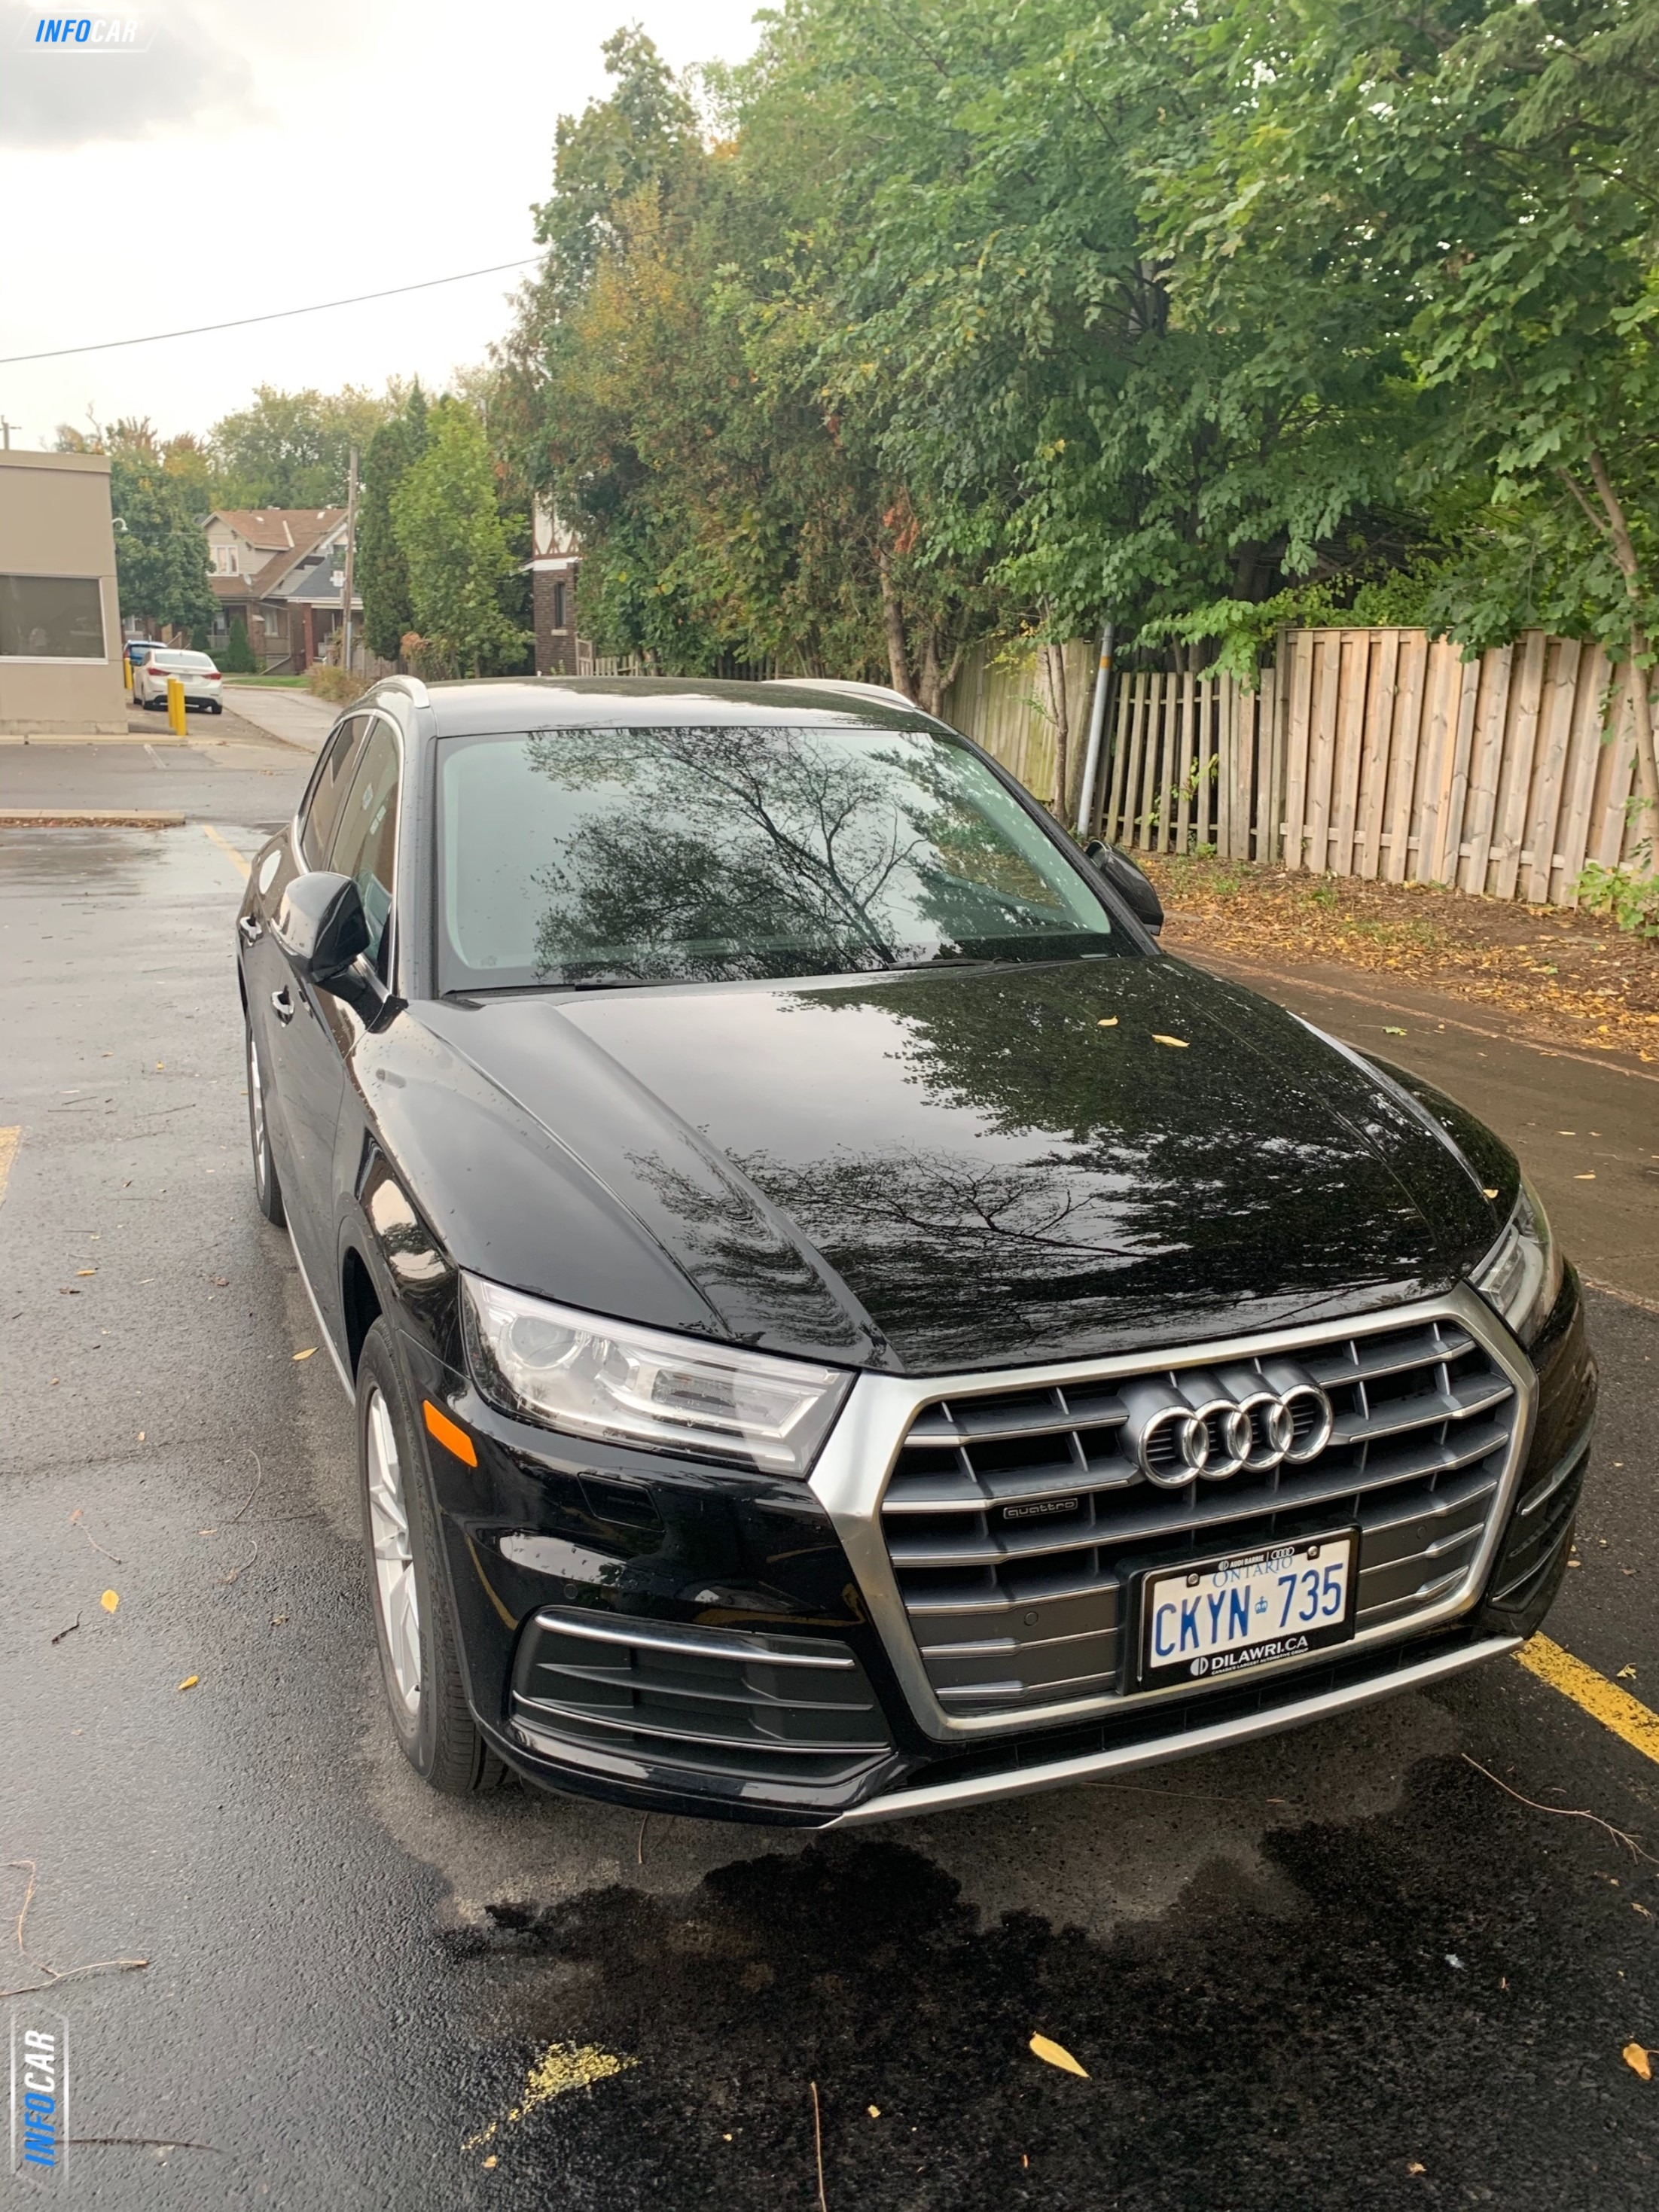 2019 Audi Q5  - INFOCAR - Toronto's Most Comprehensive New and Used Auto Trading Platform